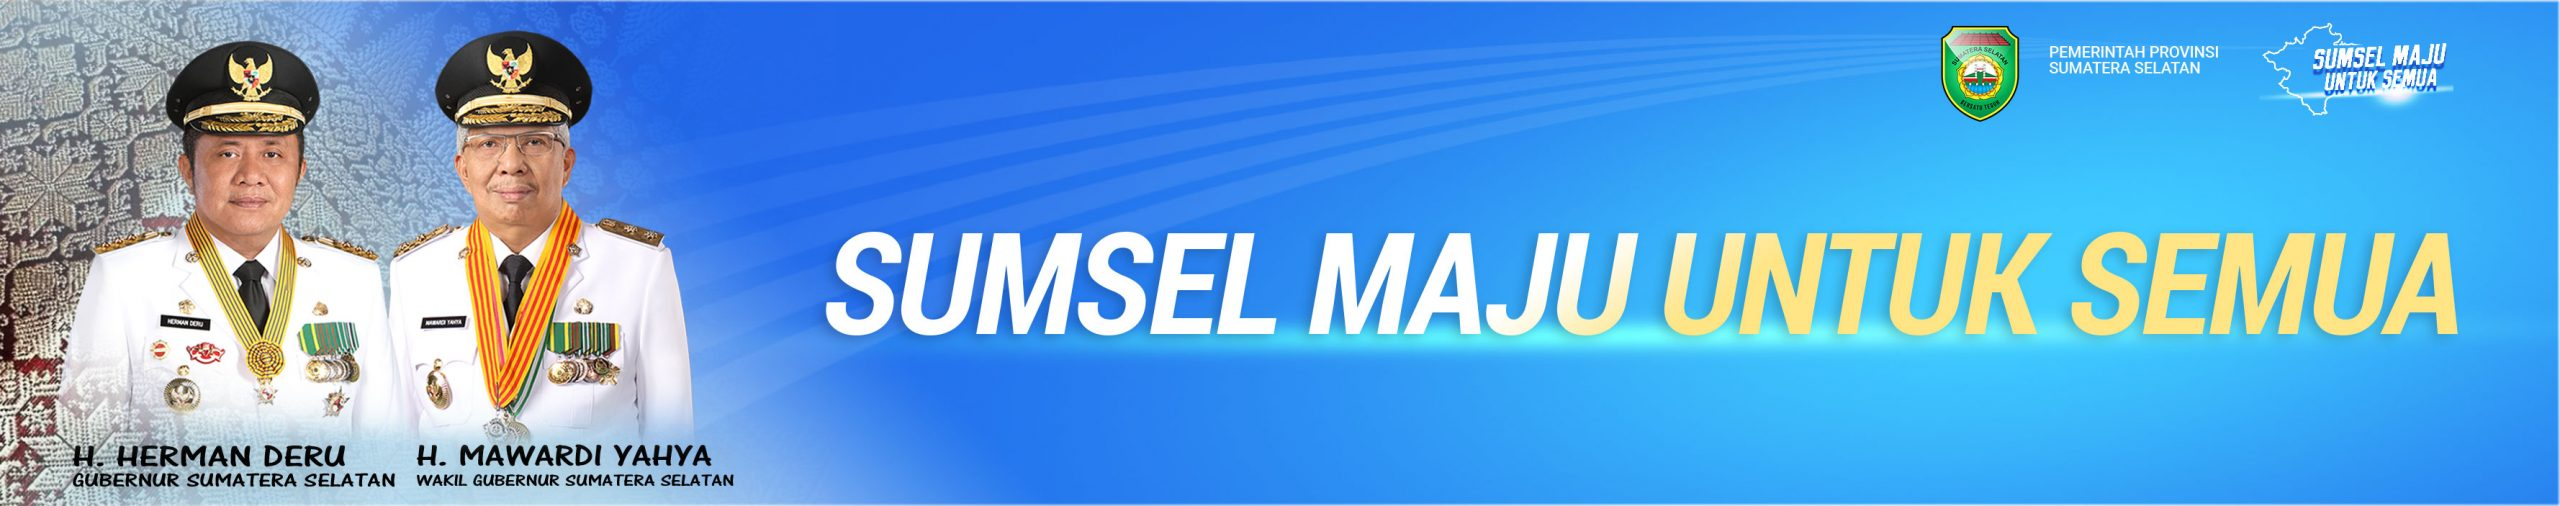 SUMSEL Maju